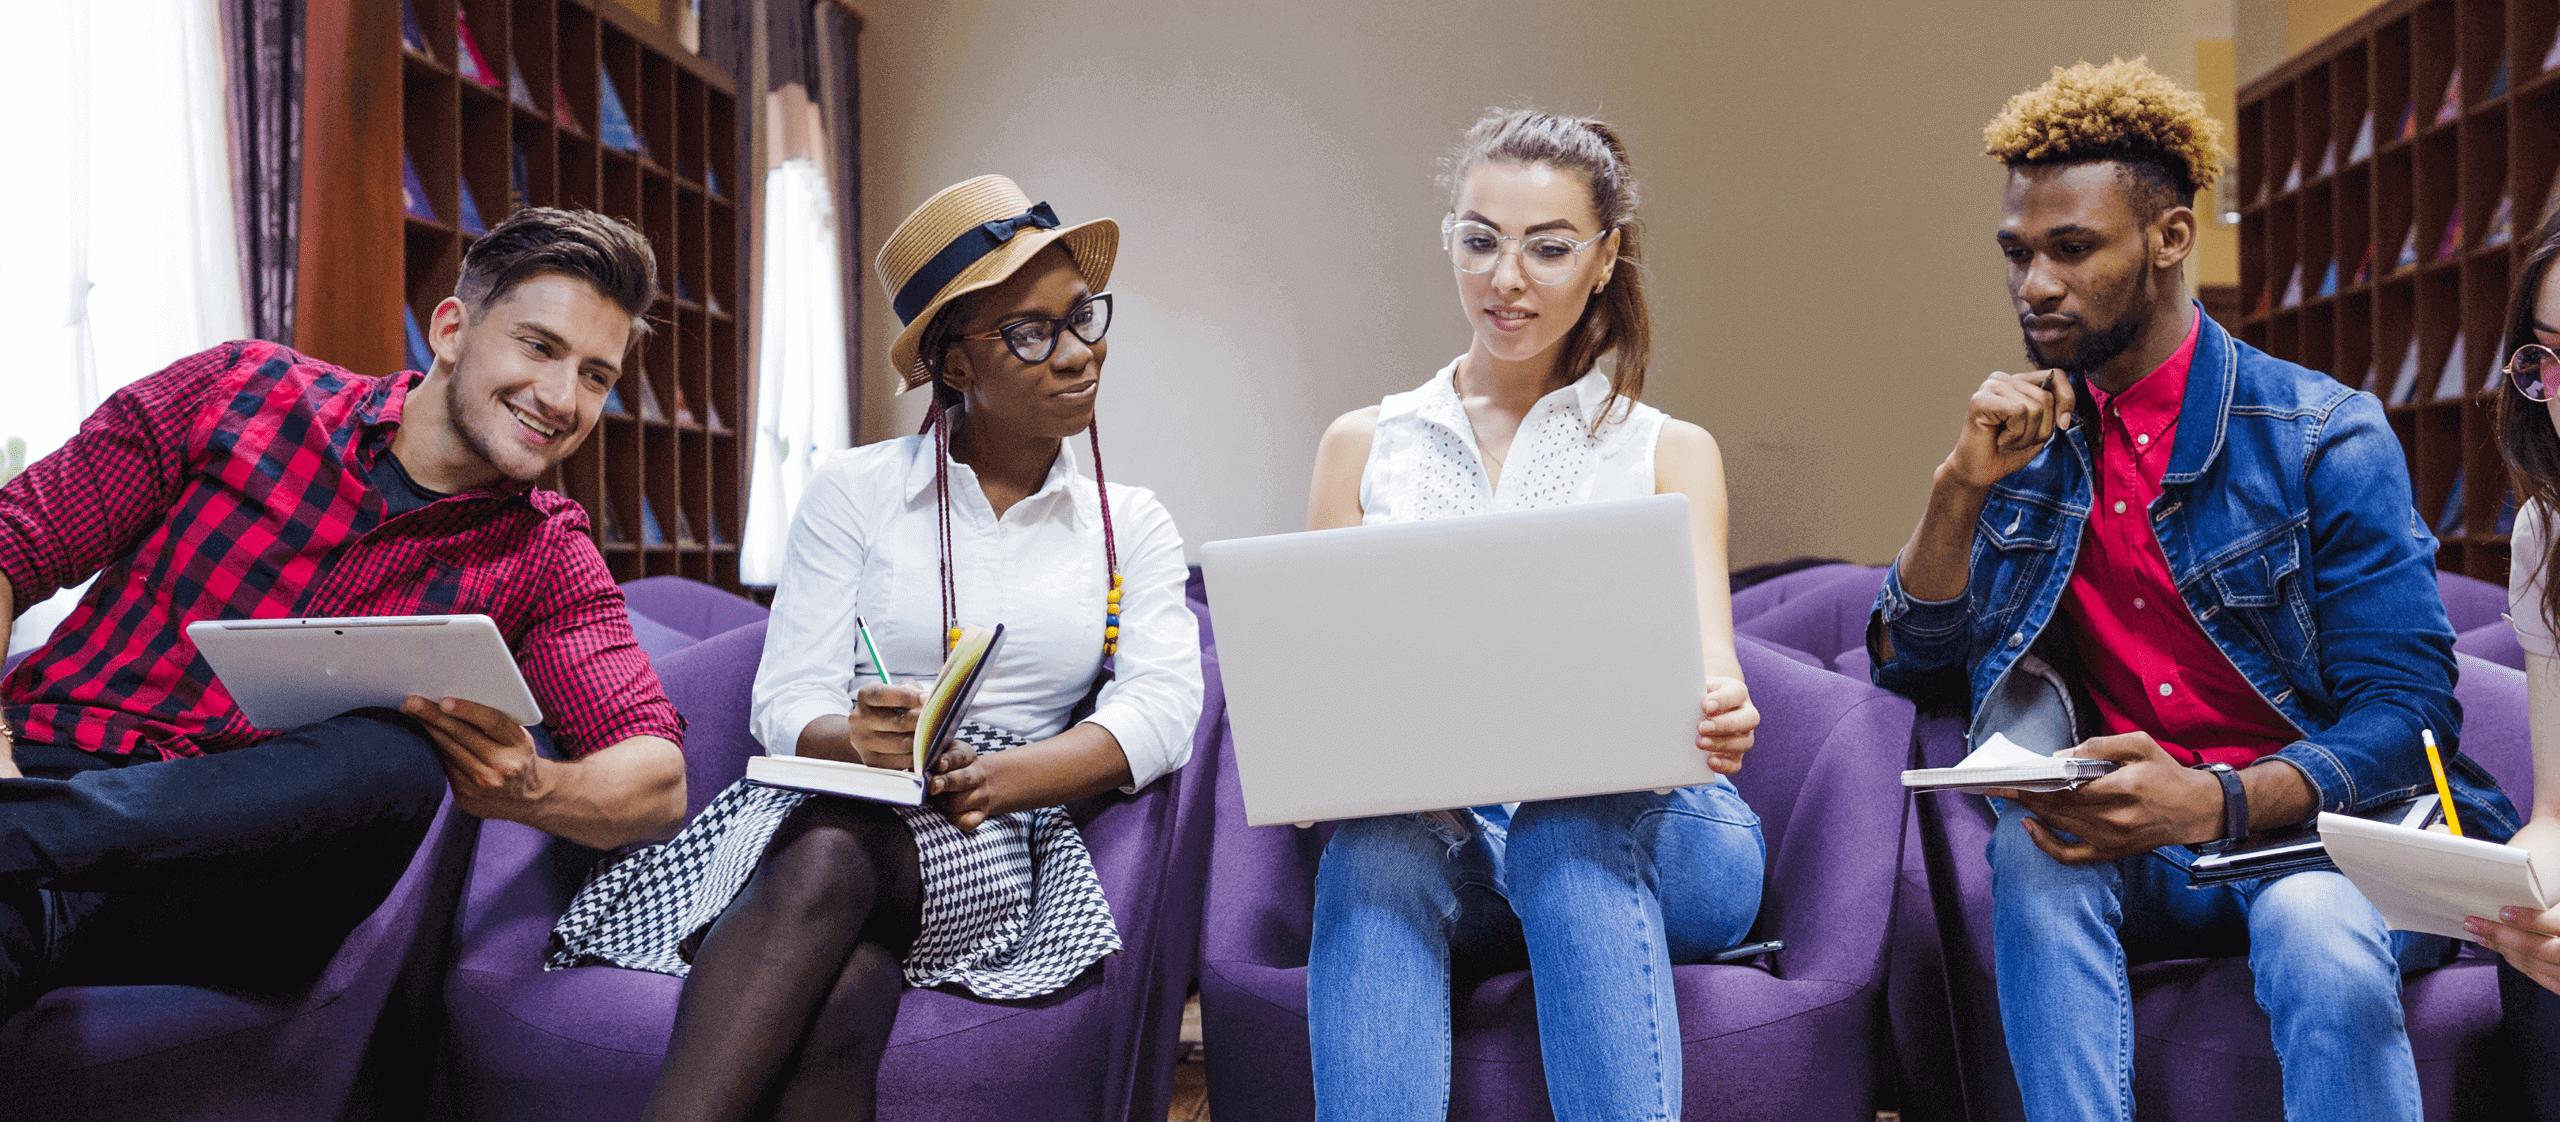 AdaptiveU - Create Online University for Free - AdaptiveU